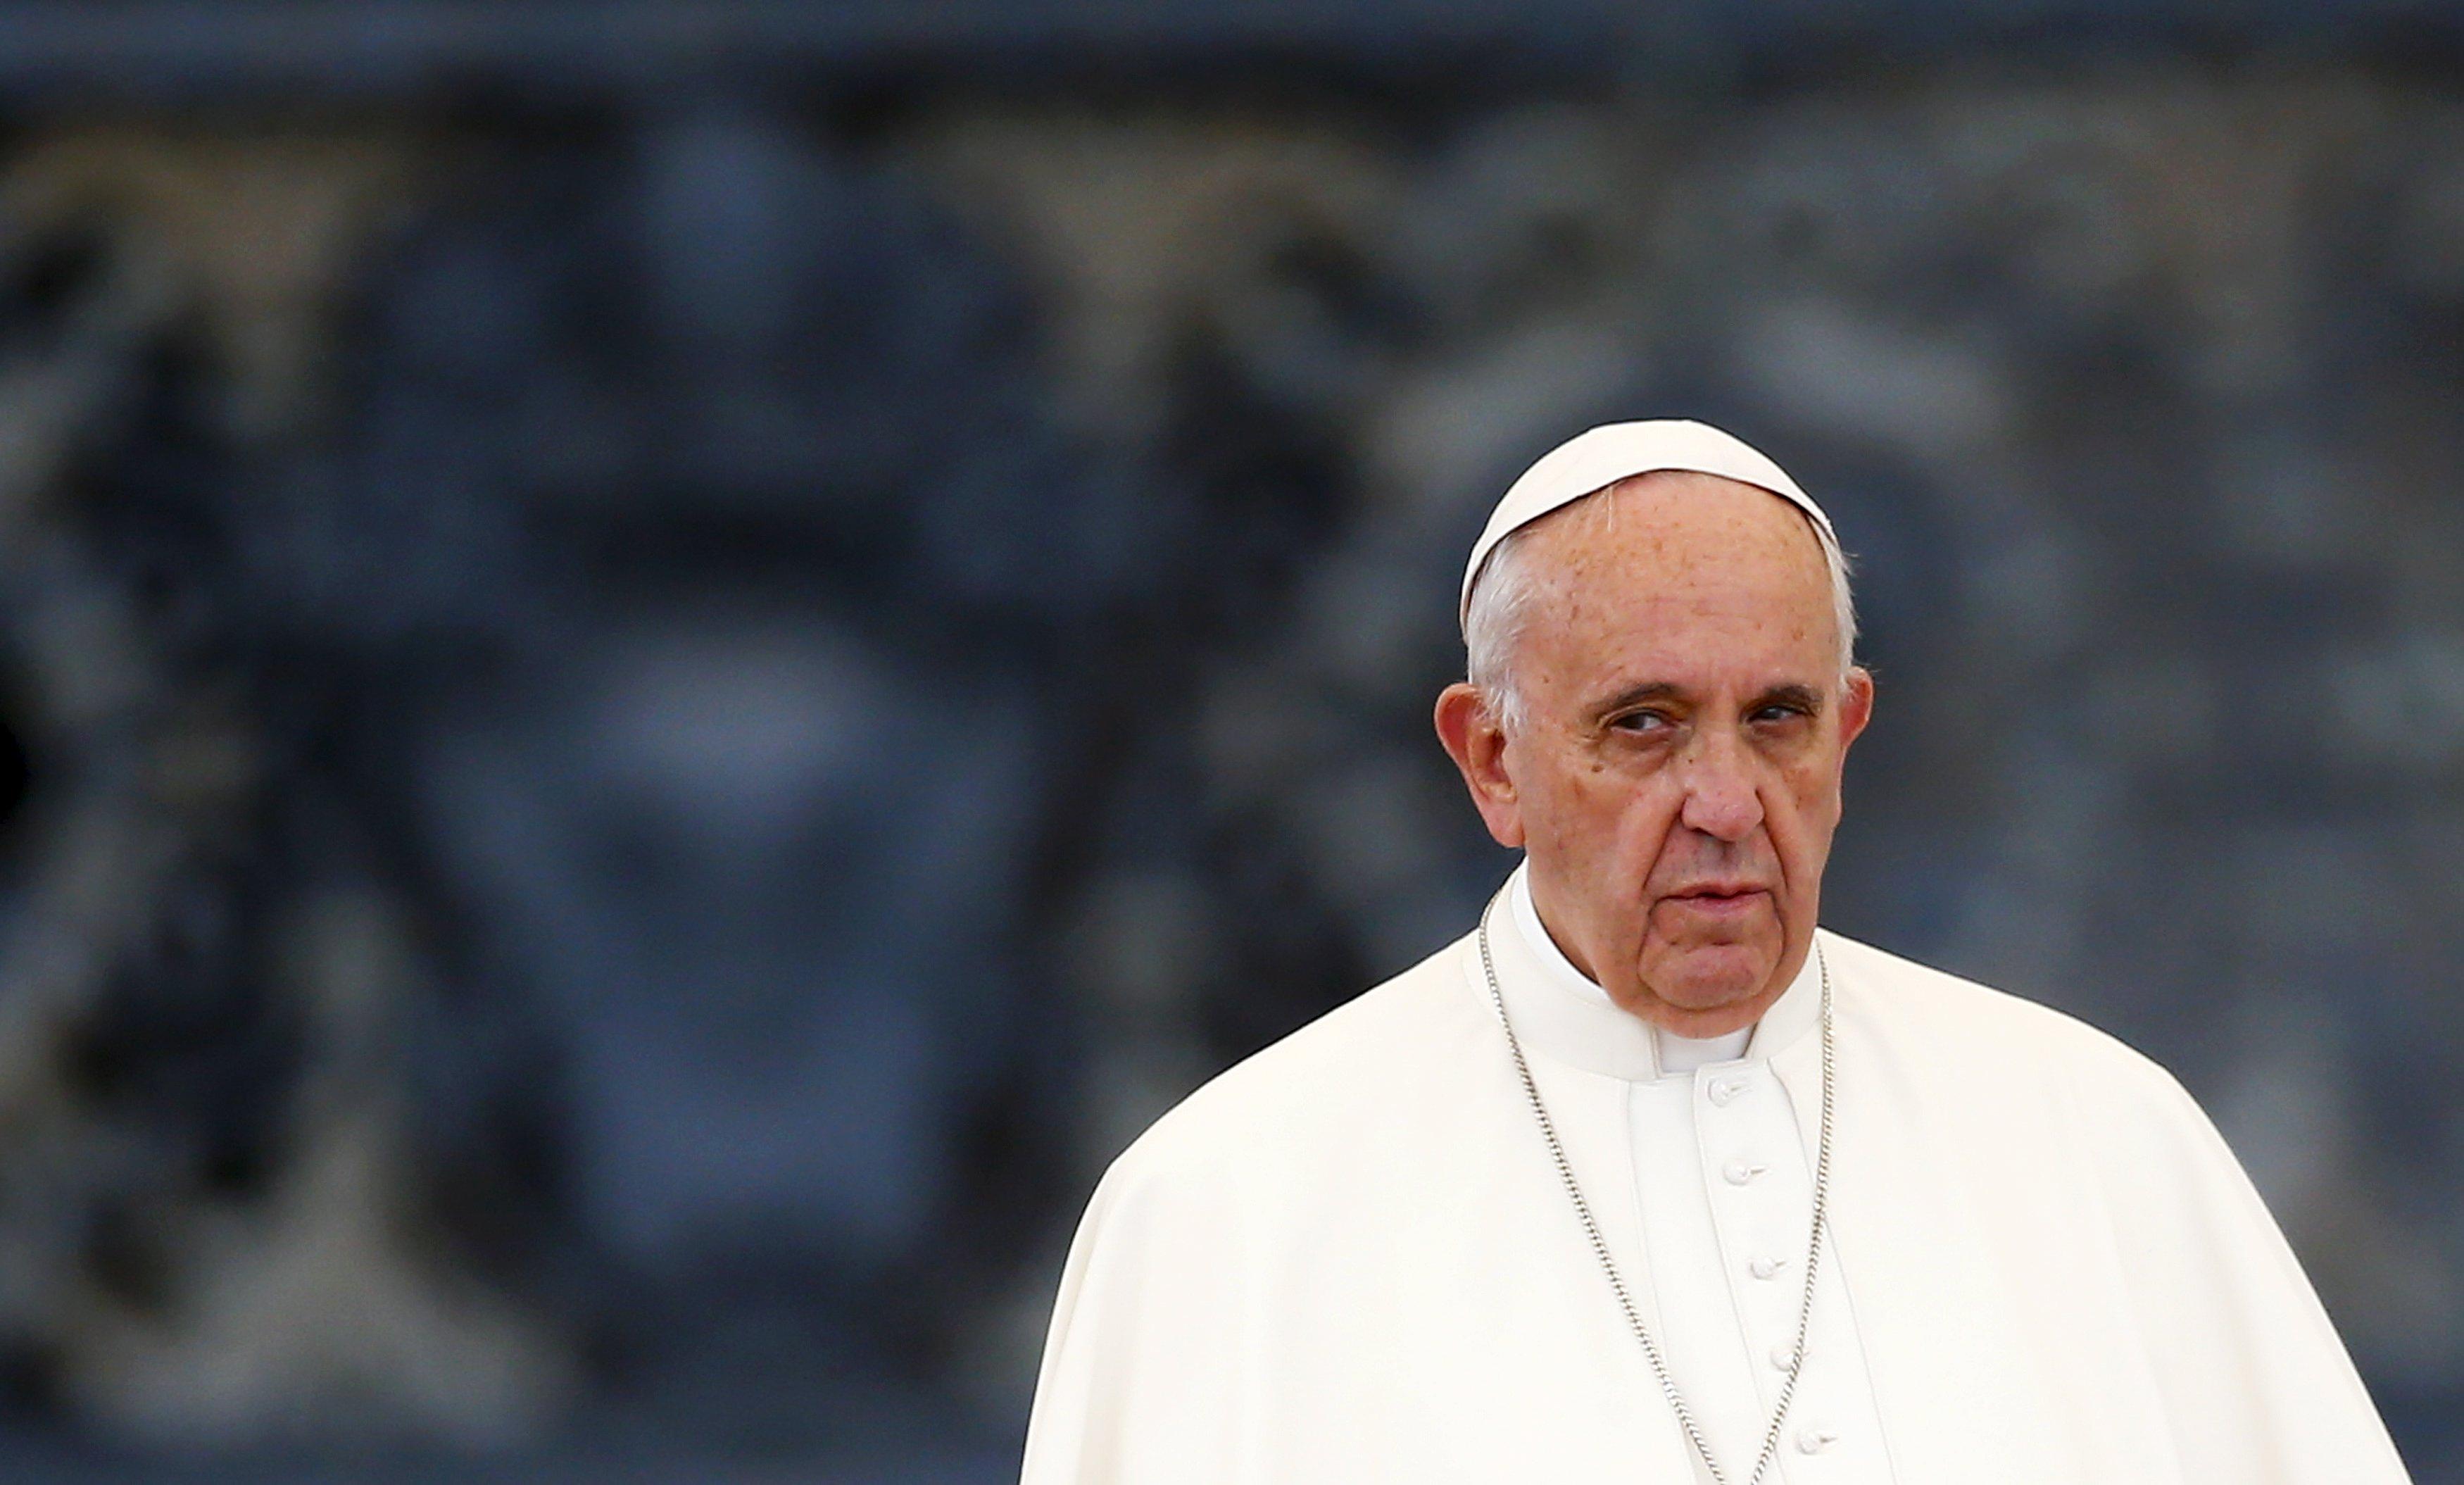 https://www.nexojornal.com.br/incoming/imagens/papa_francisco.JPG/BINARY/papa_francisco.JPG